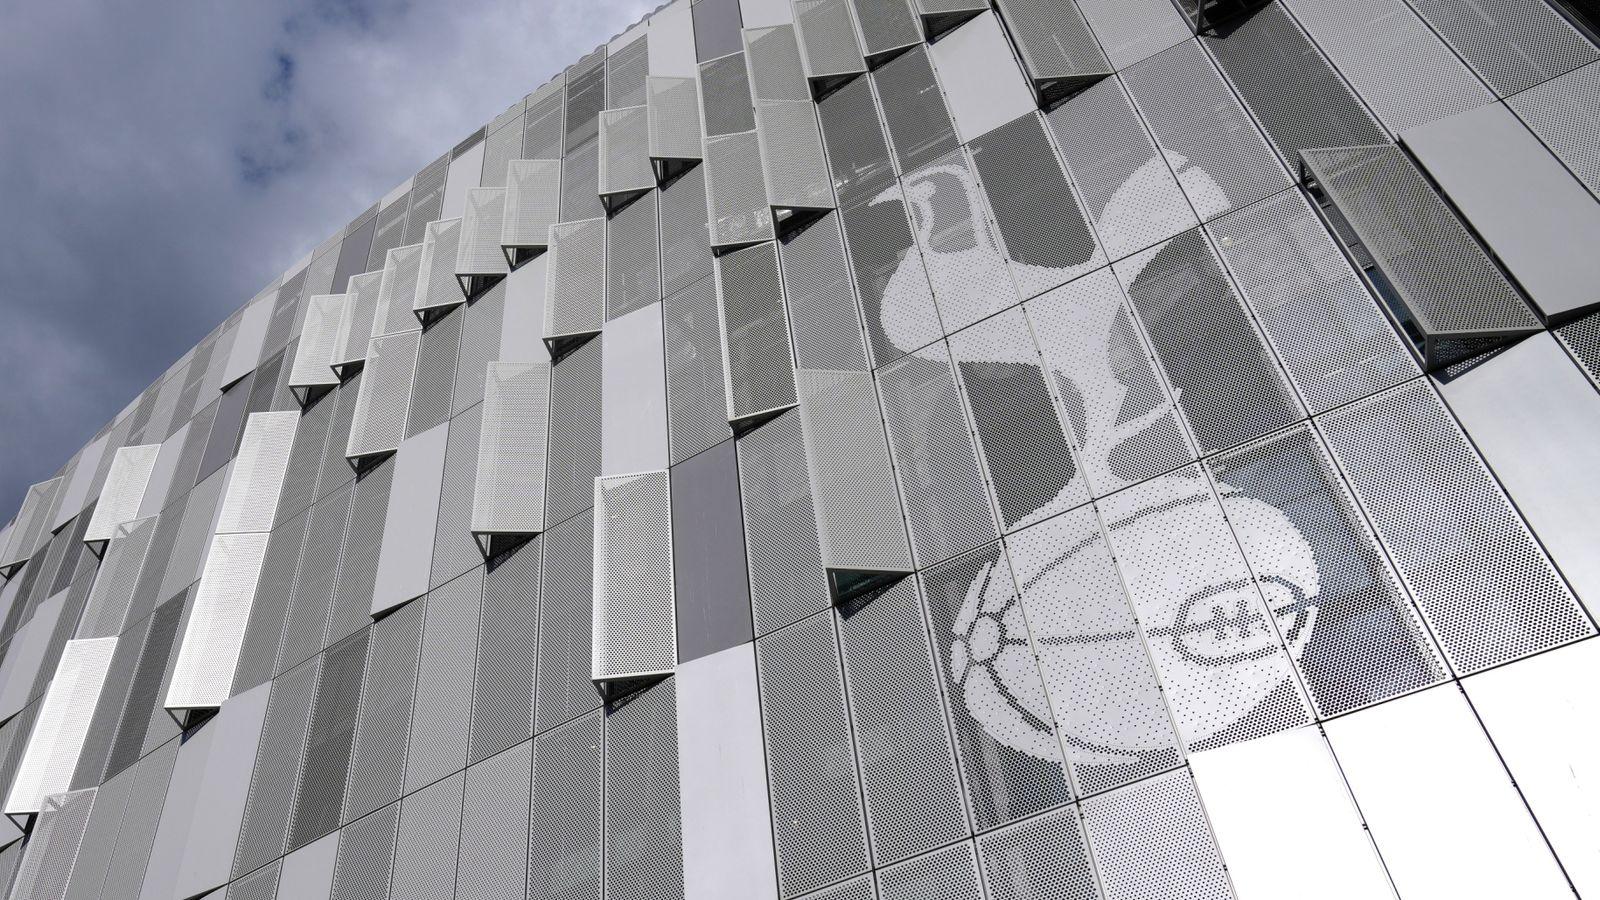 Coronavirus: Tottenham to trial NHS COVID Pass for fans attending Arsenal friendlies